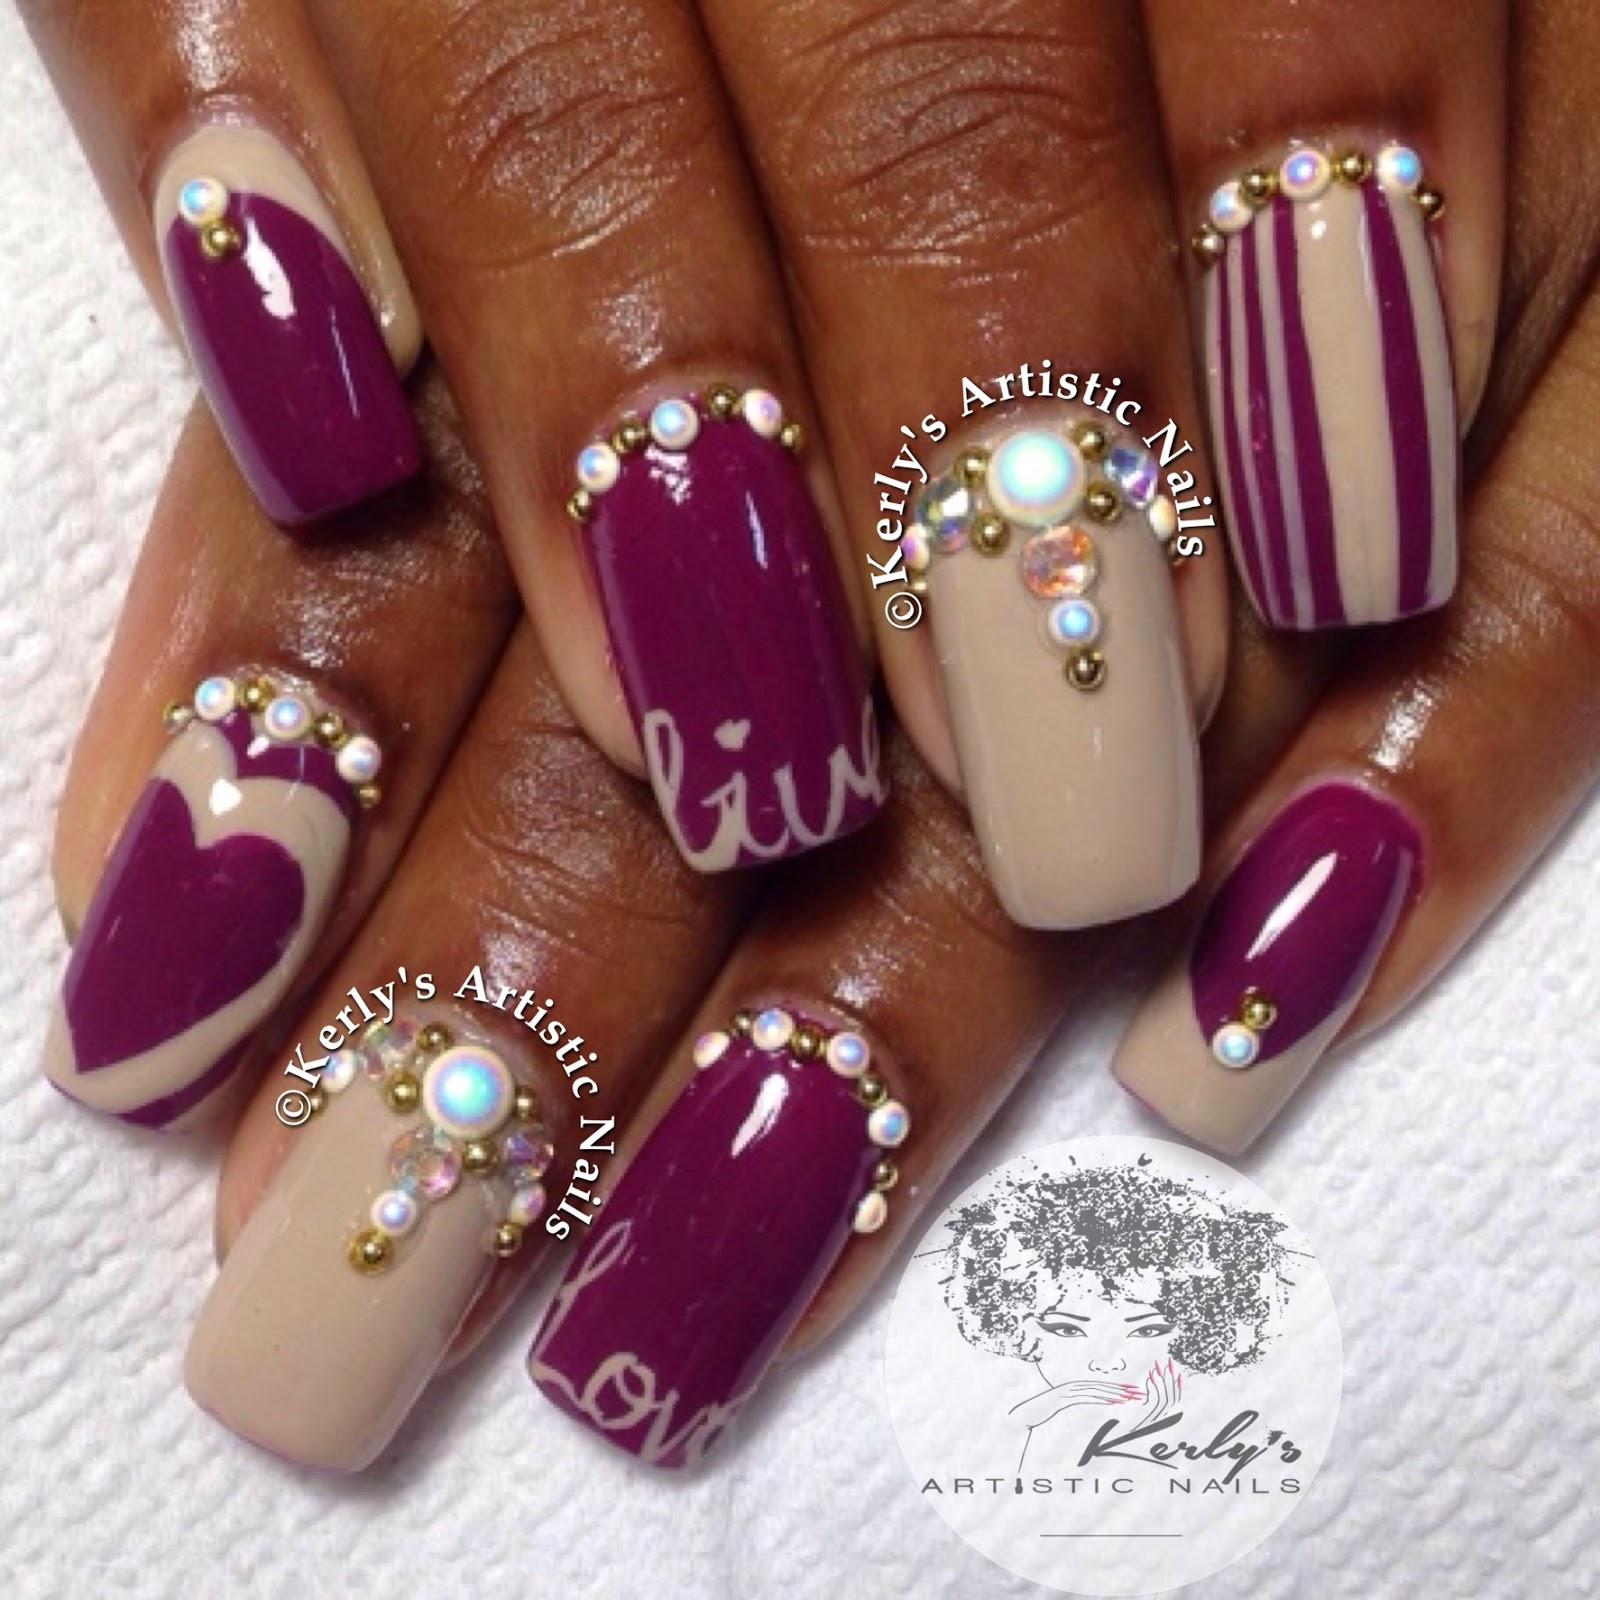 Encapsulated nail designs nail art gallery encapsulated nail art photos prinsesfo Choice Image